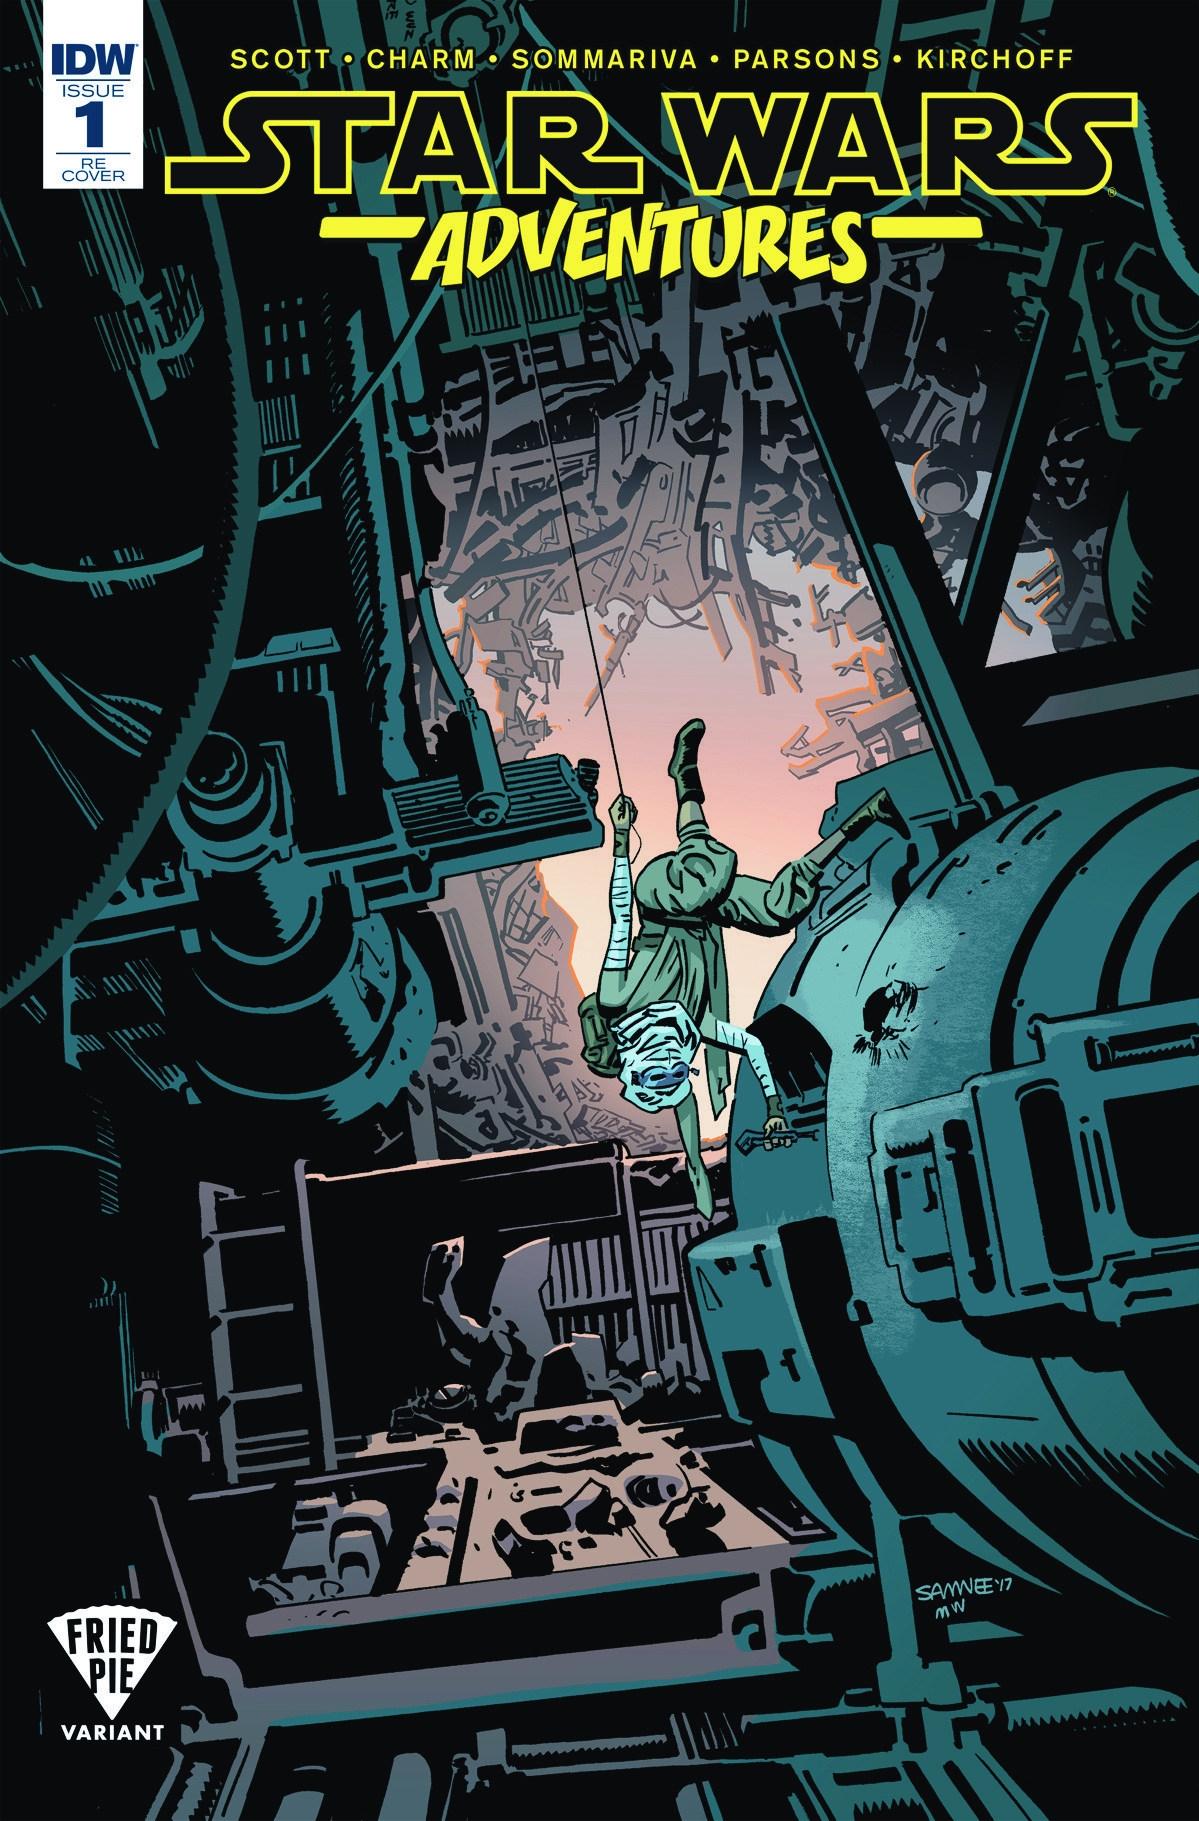 Star Wars Adventures #1 (Chris Samnee Fried Pie Comics Variant Cover) (06.09.2017)